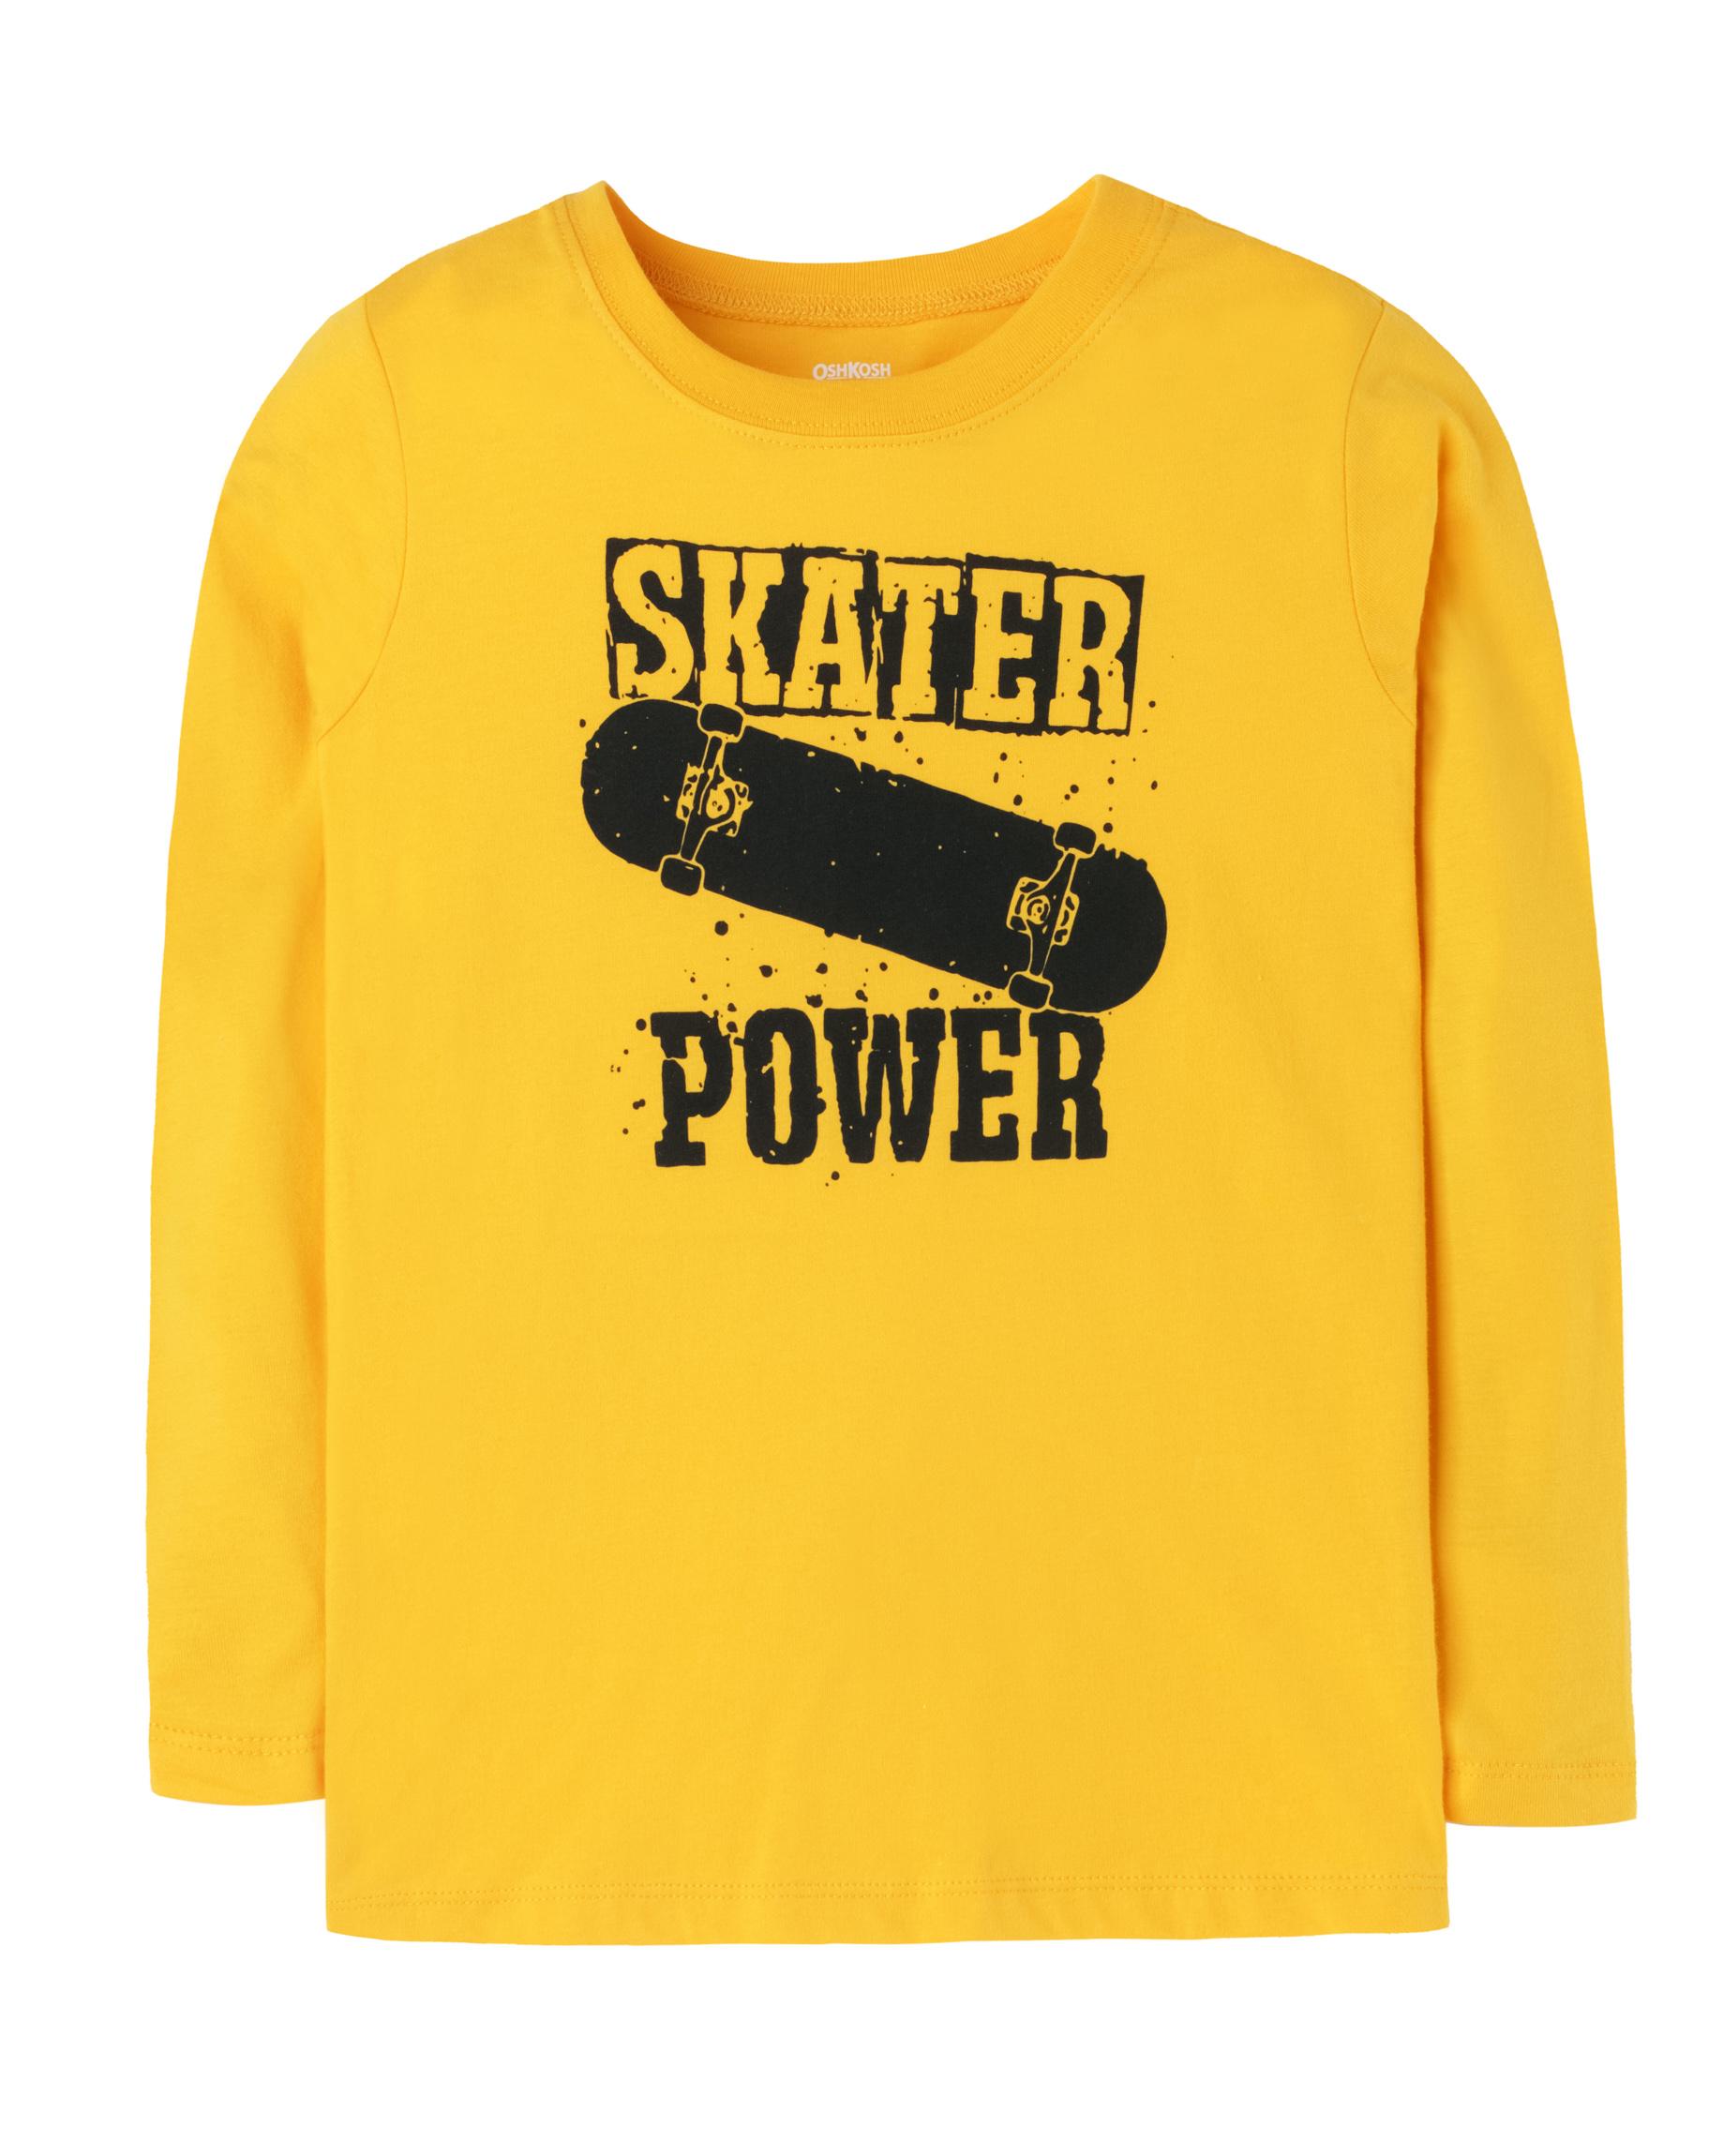 SKATER POWER חולצת